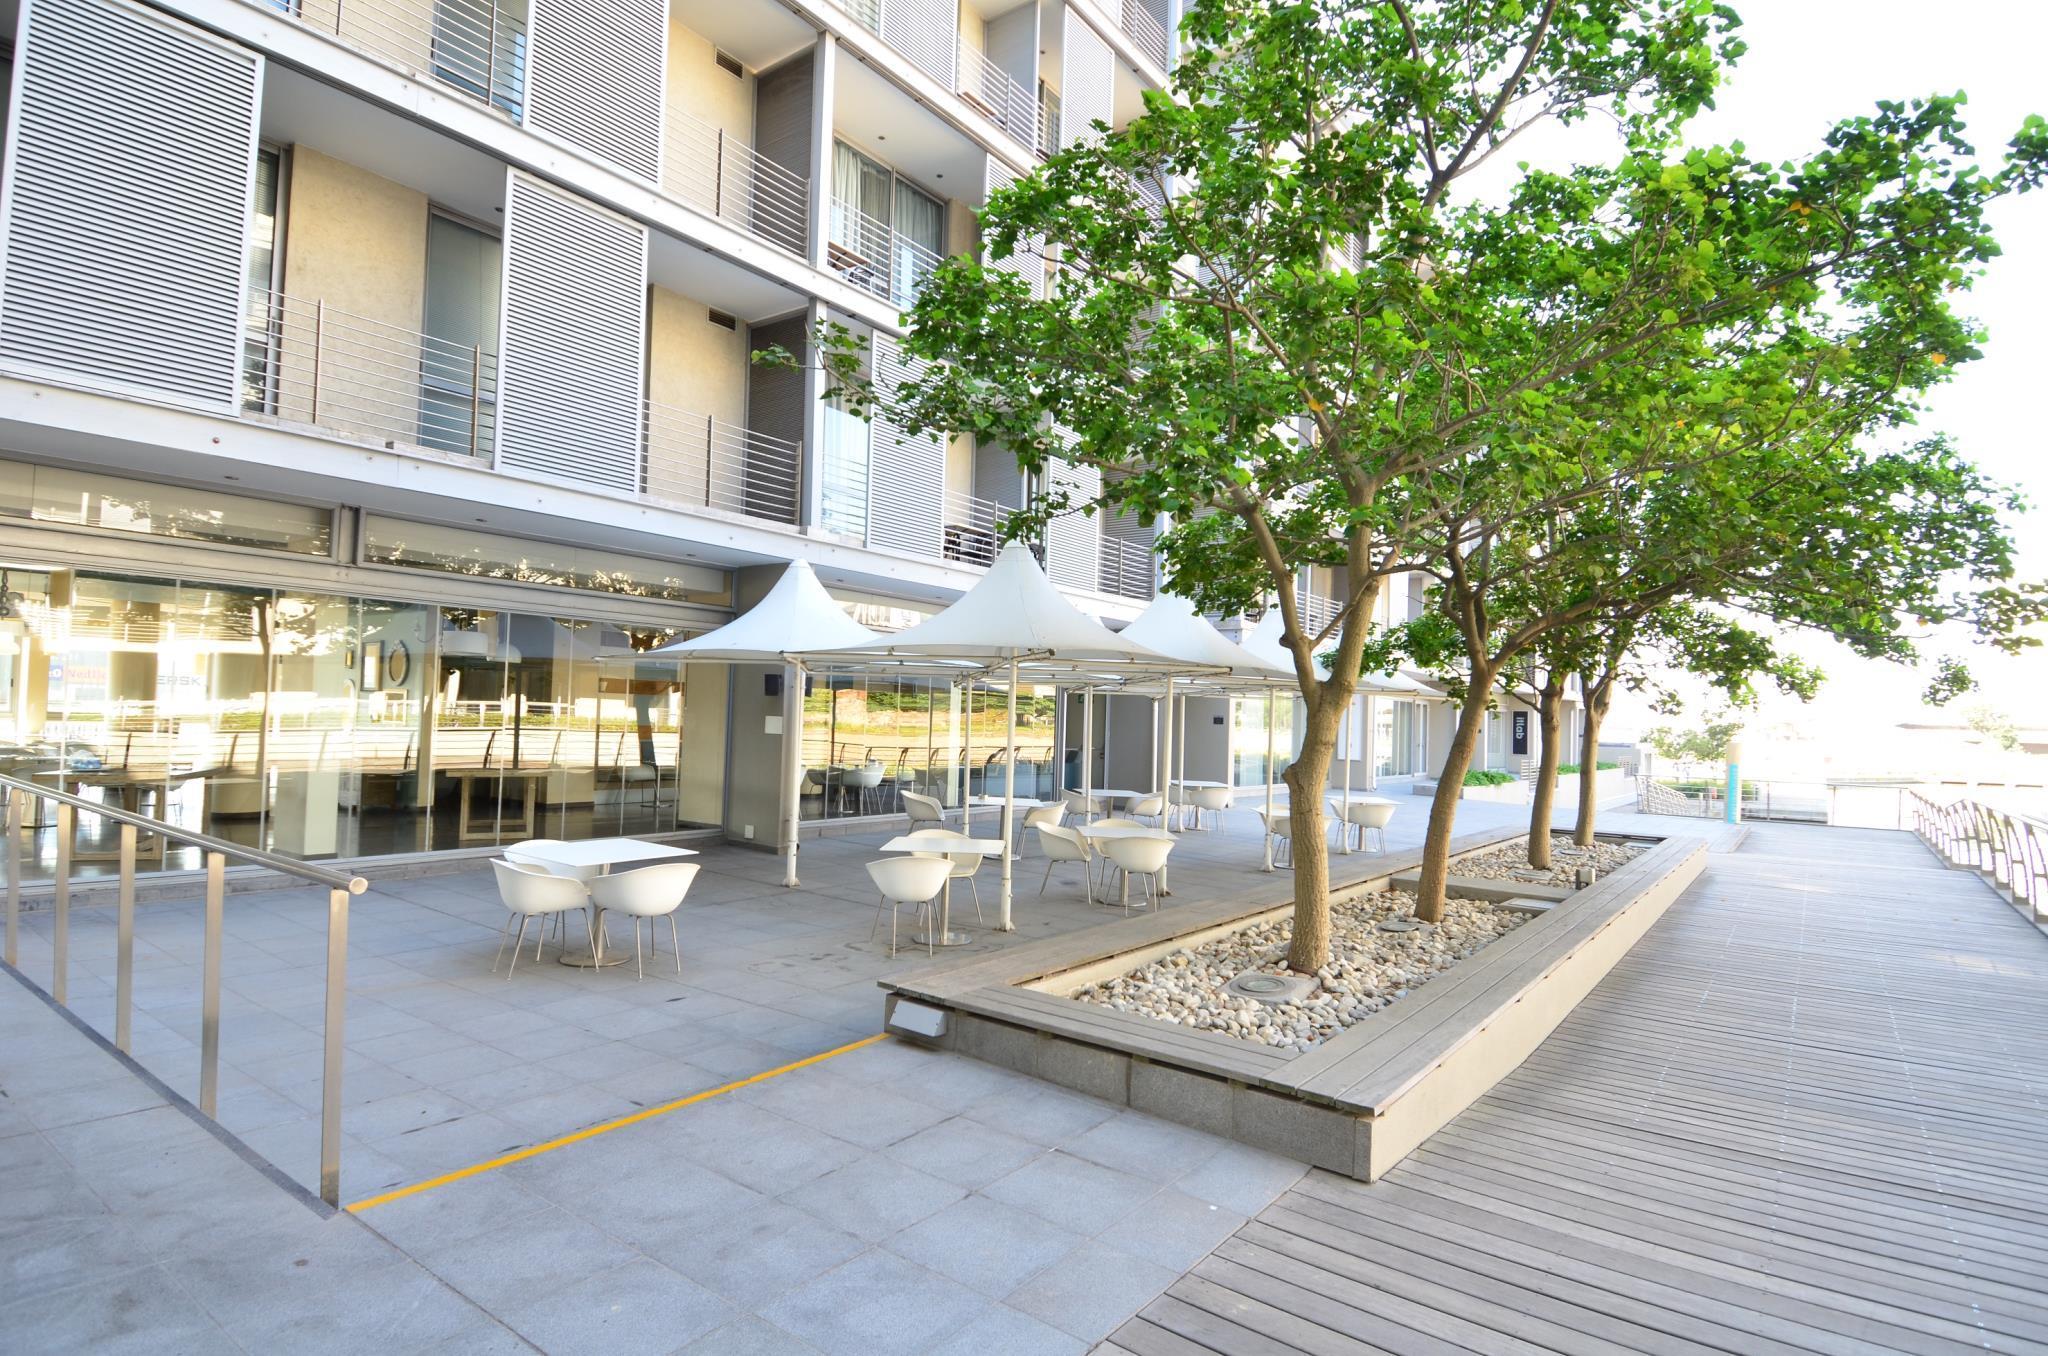 410 And 214 Harbour Bridge Luxury Apartements